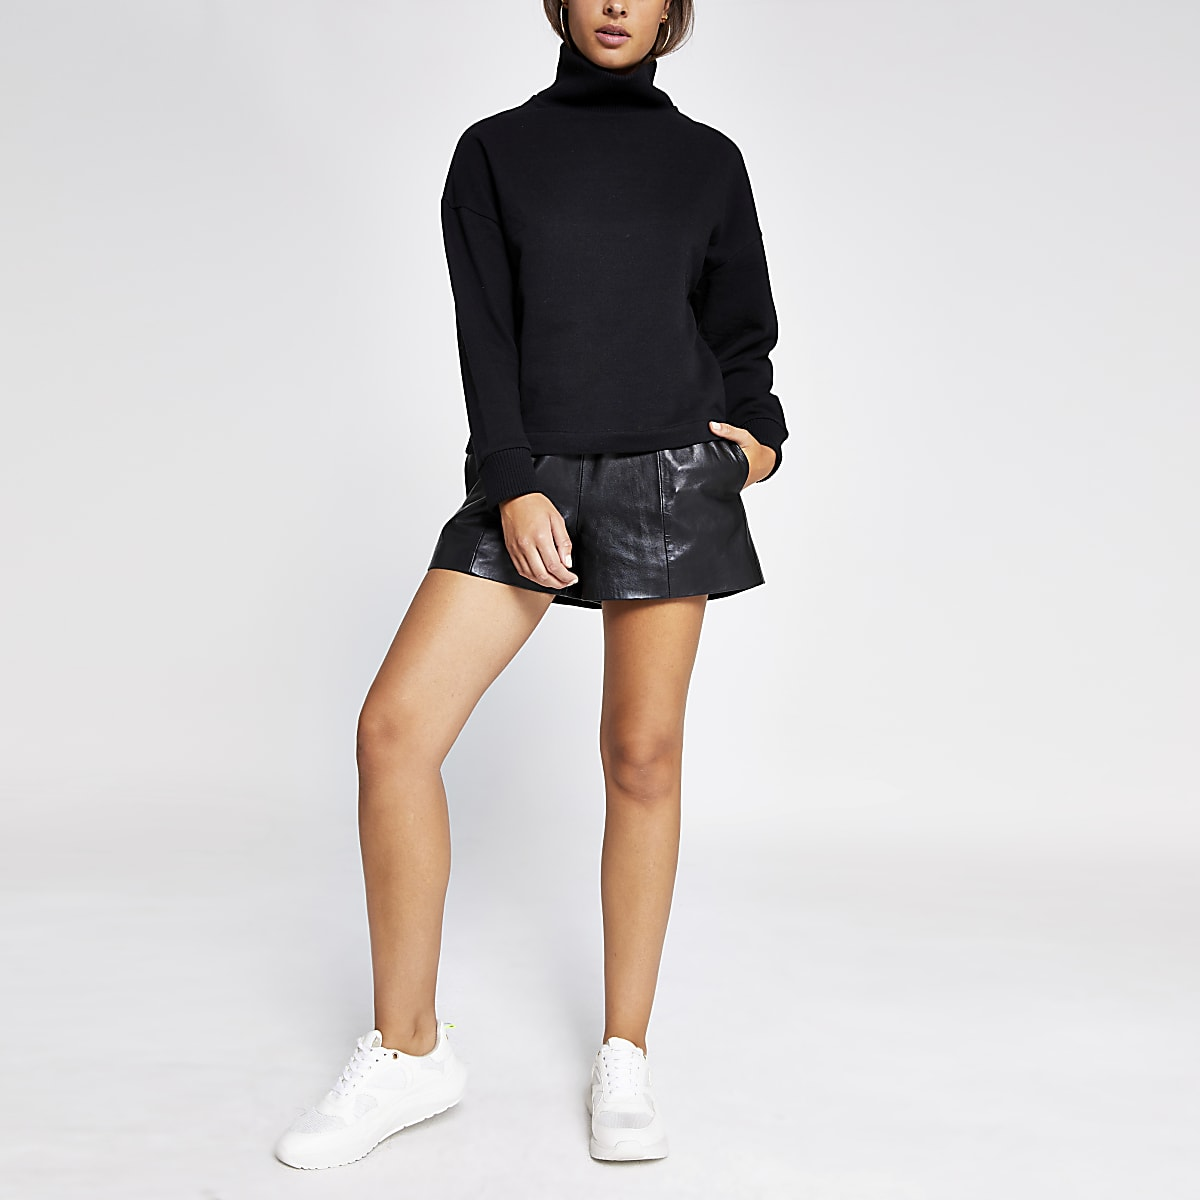 Black ribbed high neck sweatshirt